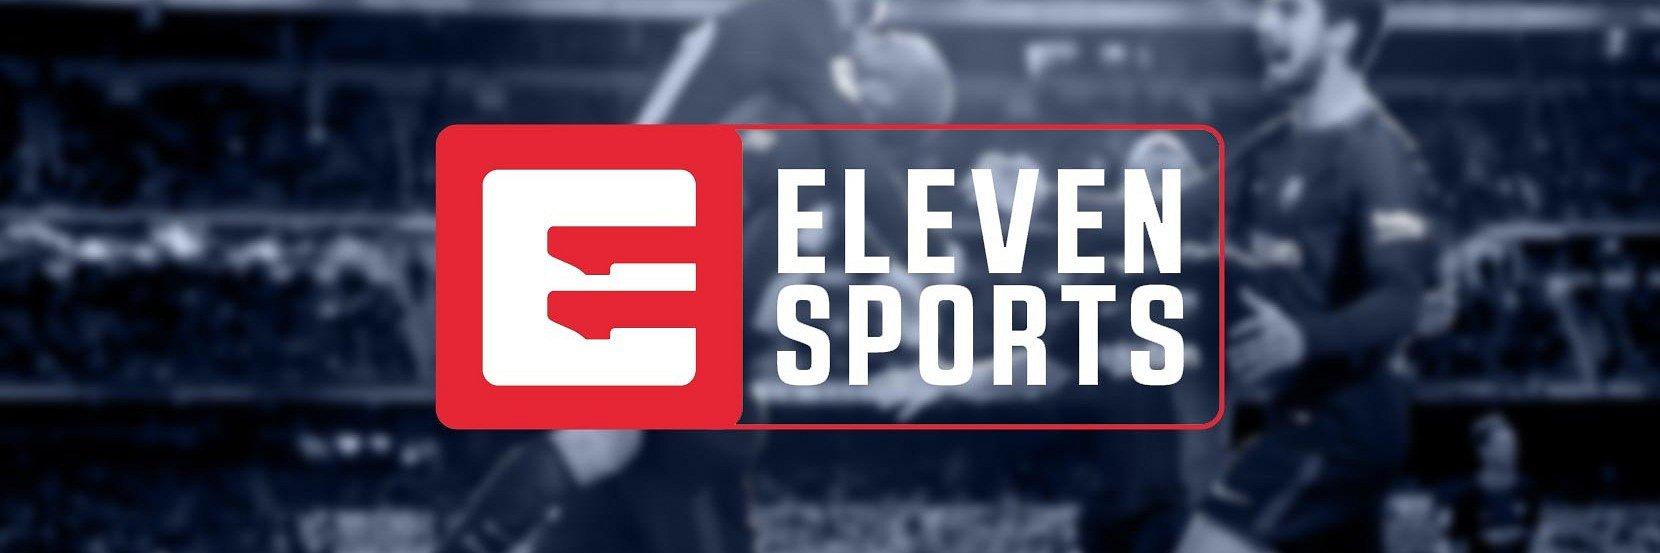 Eleven Sports marca regresso da Bundesliga com passatempo